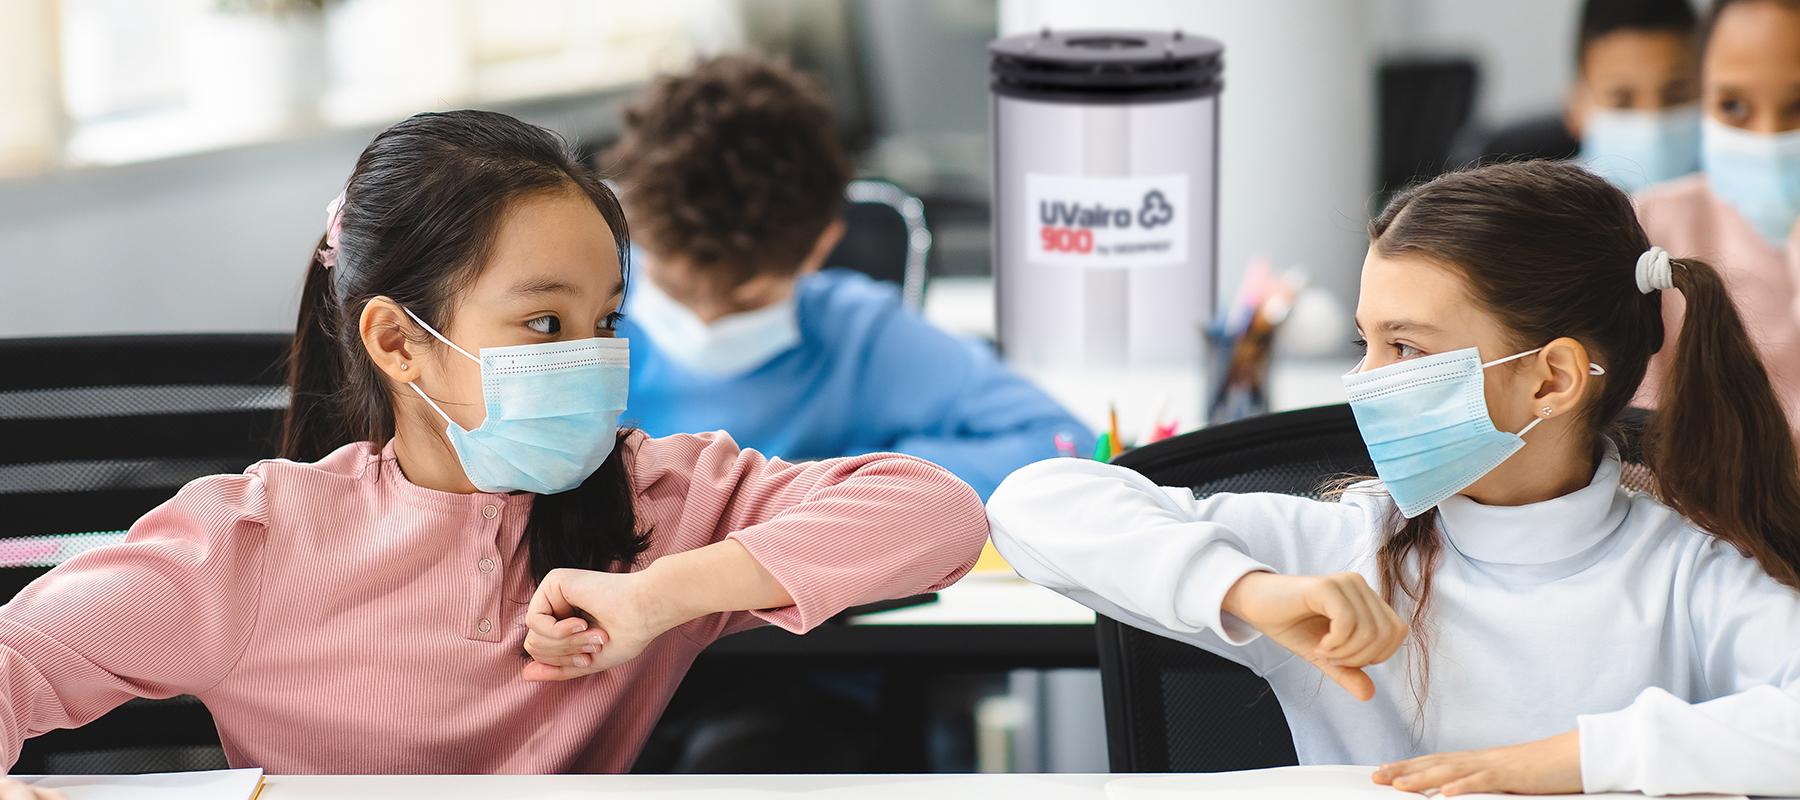 UVairo Air Sanitizer for Education image